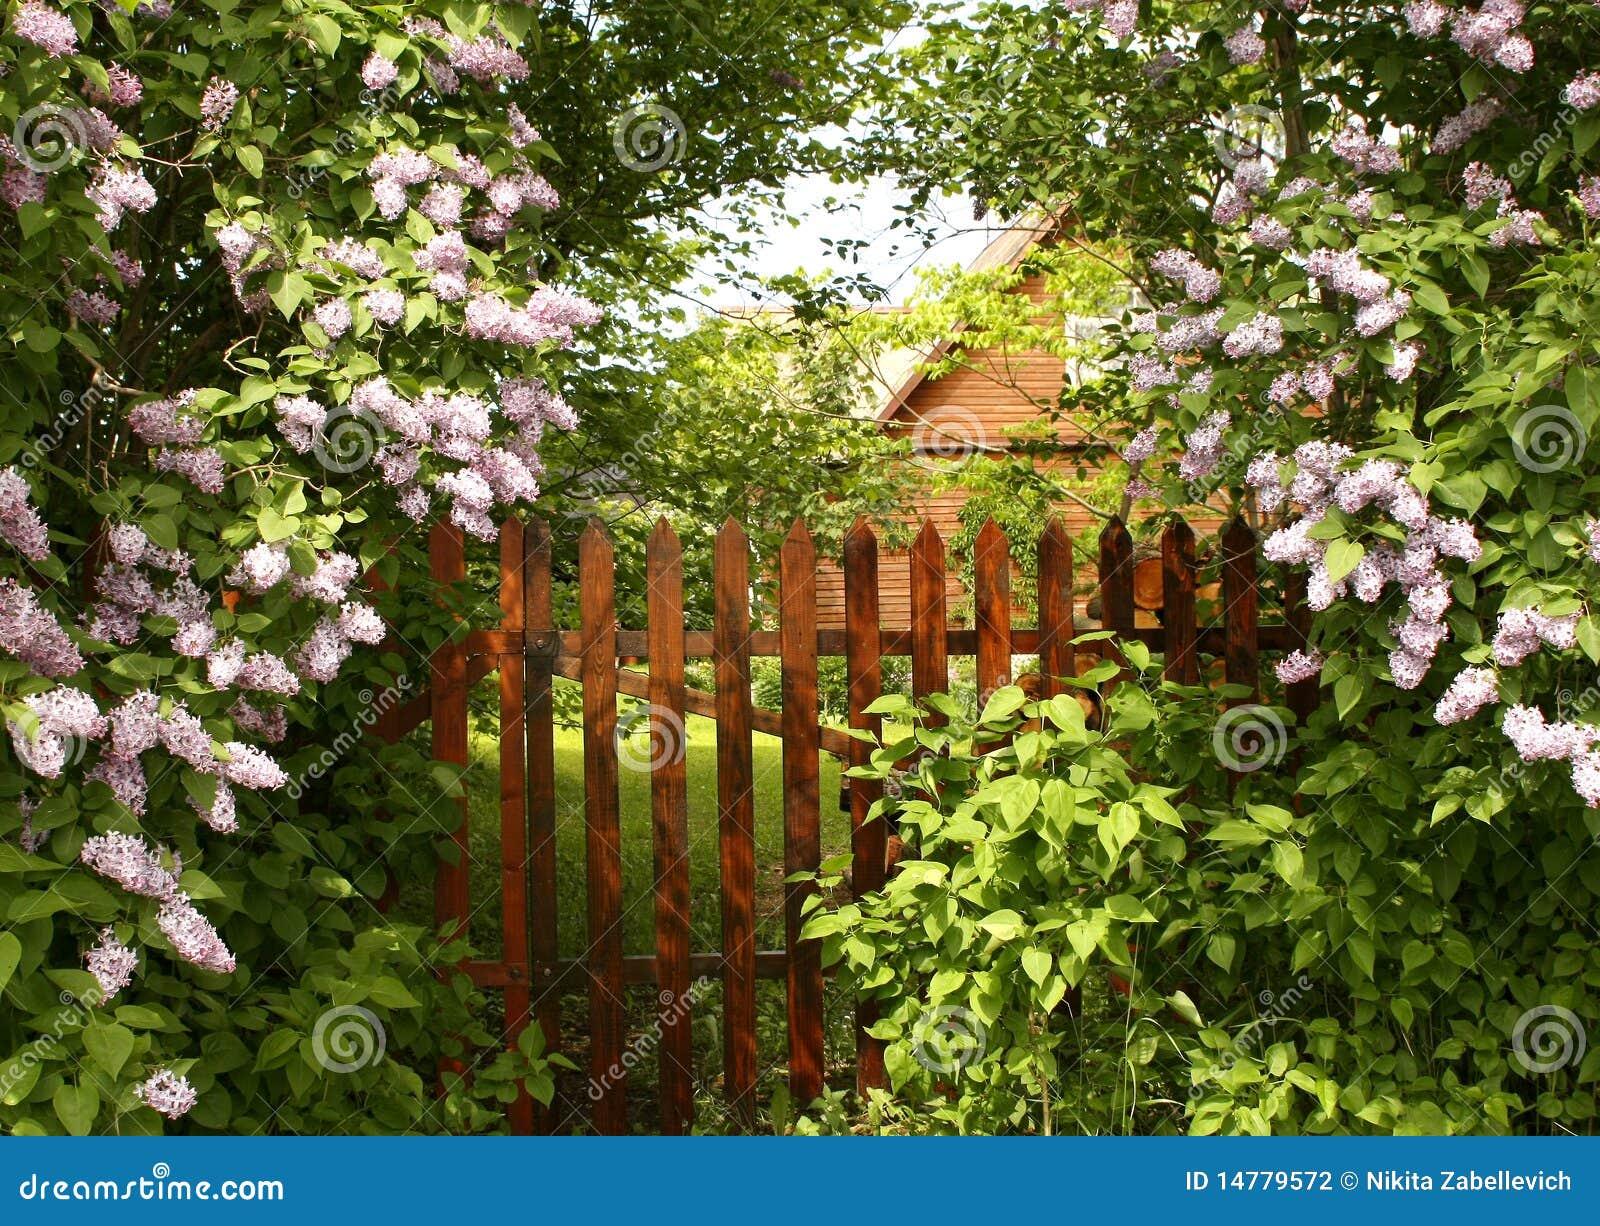 Entr e secr te au jardin photographie stock image 14779572 for Au jardin